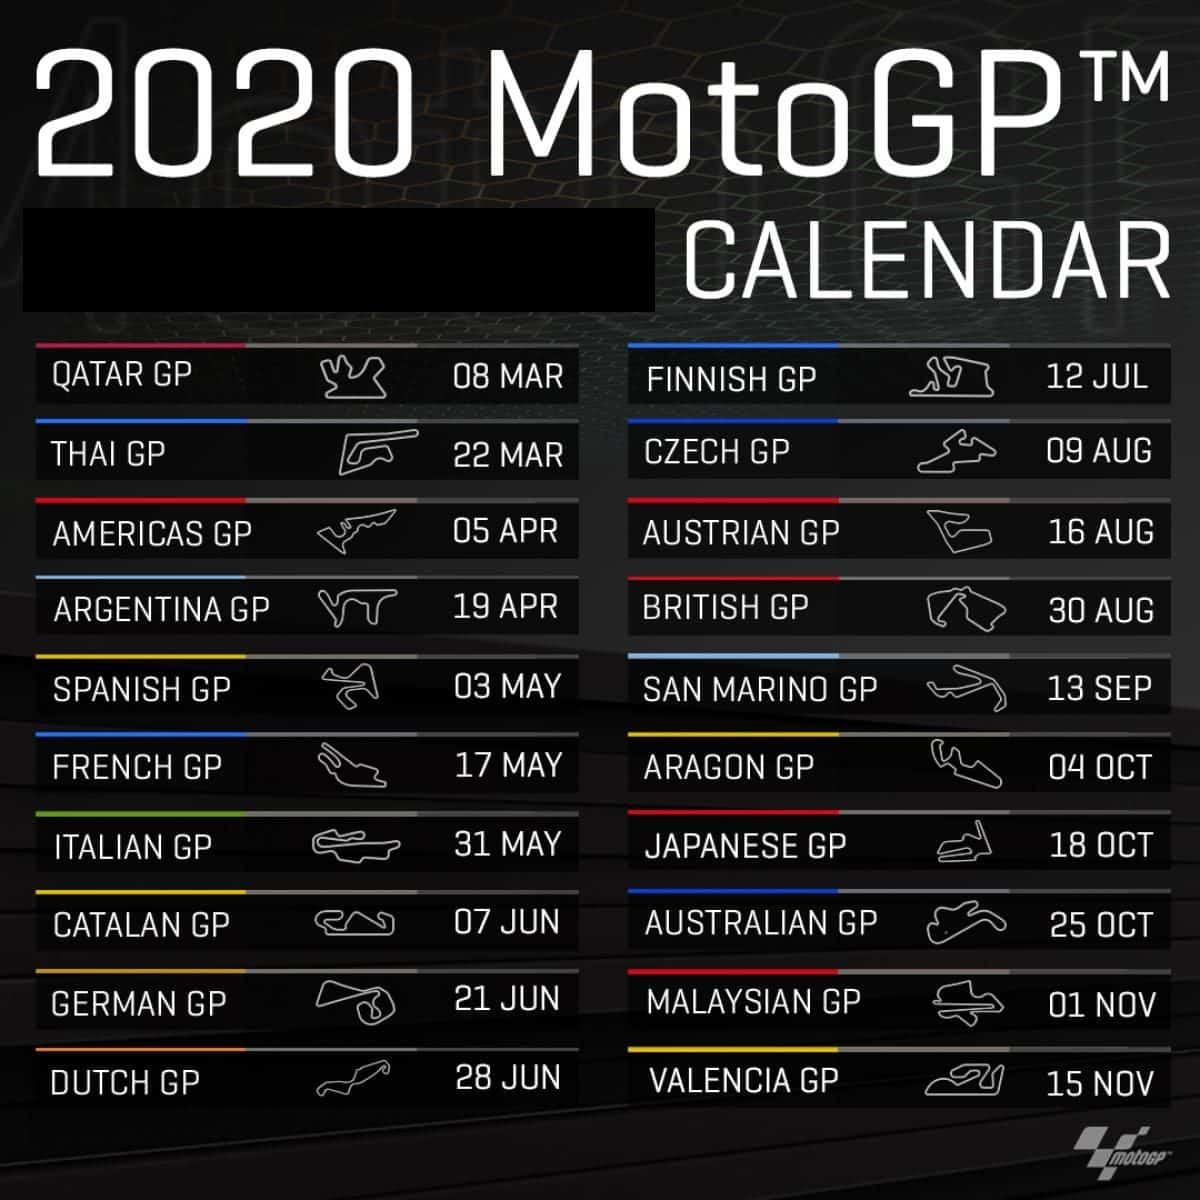 Calendario MotoGP 2020: Date Gran Premi Diretta TV Sky e TV8